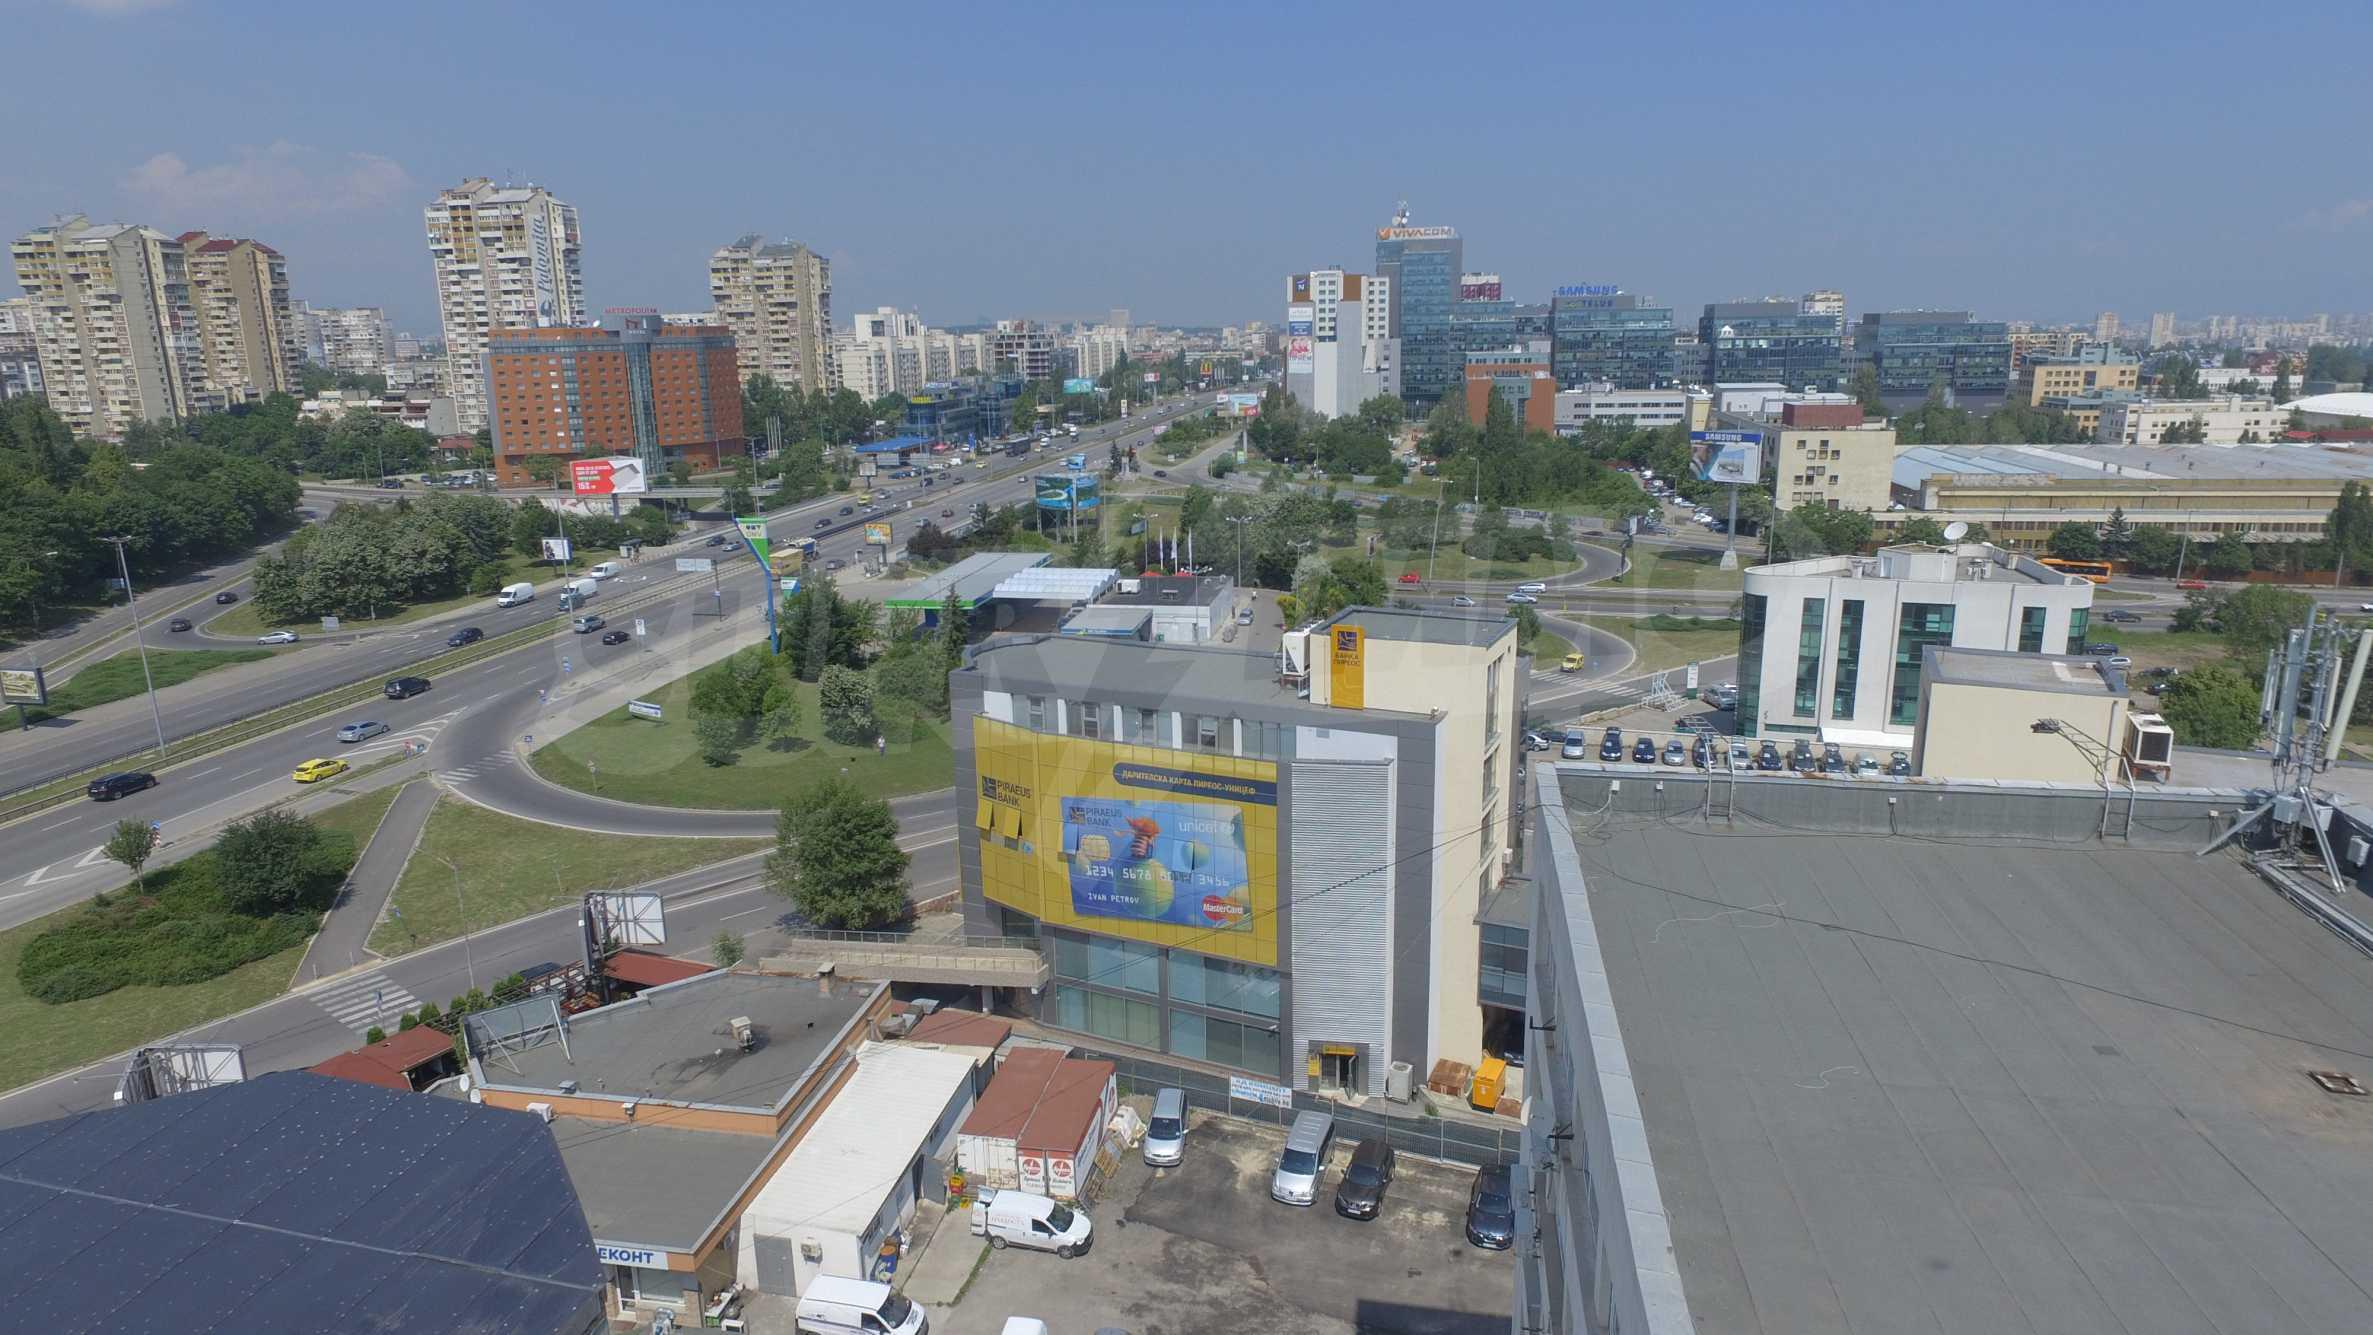 Офис в бизнес сграда висок клас на бул. Цариградско шосе 45